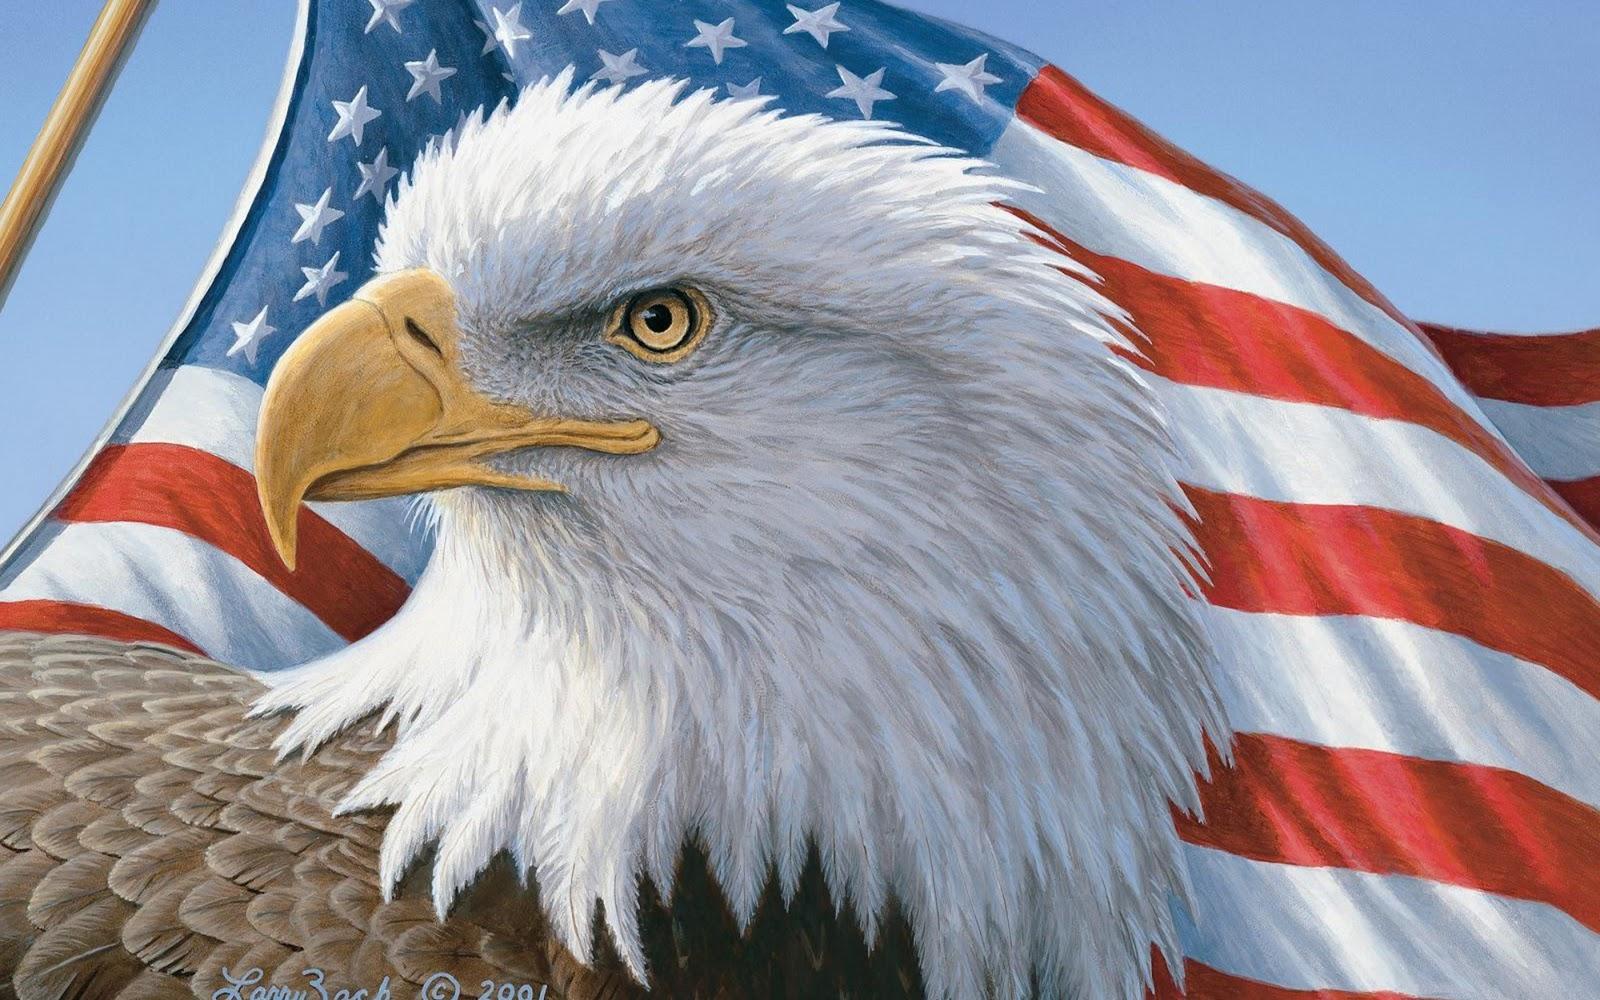 http://1.bp.blogspot.com/-BQjCxl9dFJU/Tr-7acxEbYI/AAAAAAAAG-I/n9aPXikhlc4/s1600/867957-1920x1200-proud-to-be-an-american---eagle-larry-zach.jpg